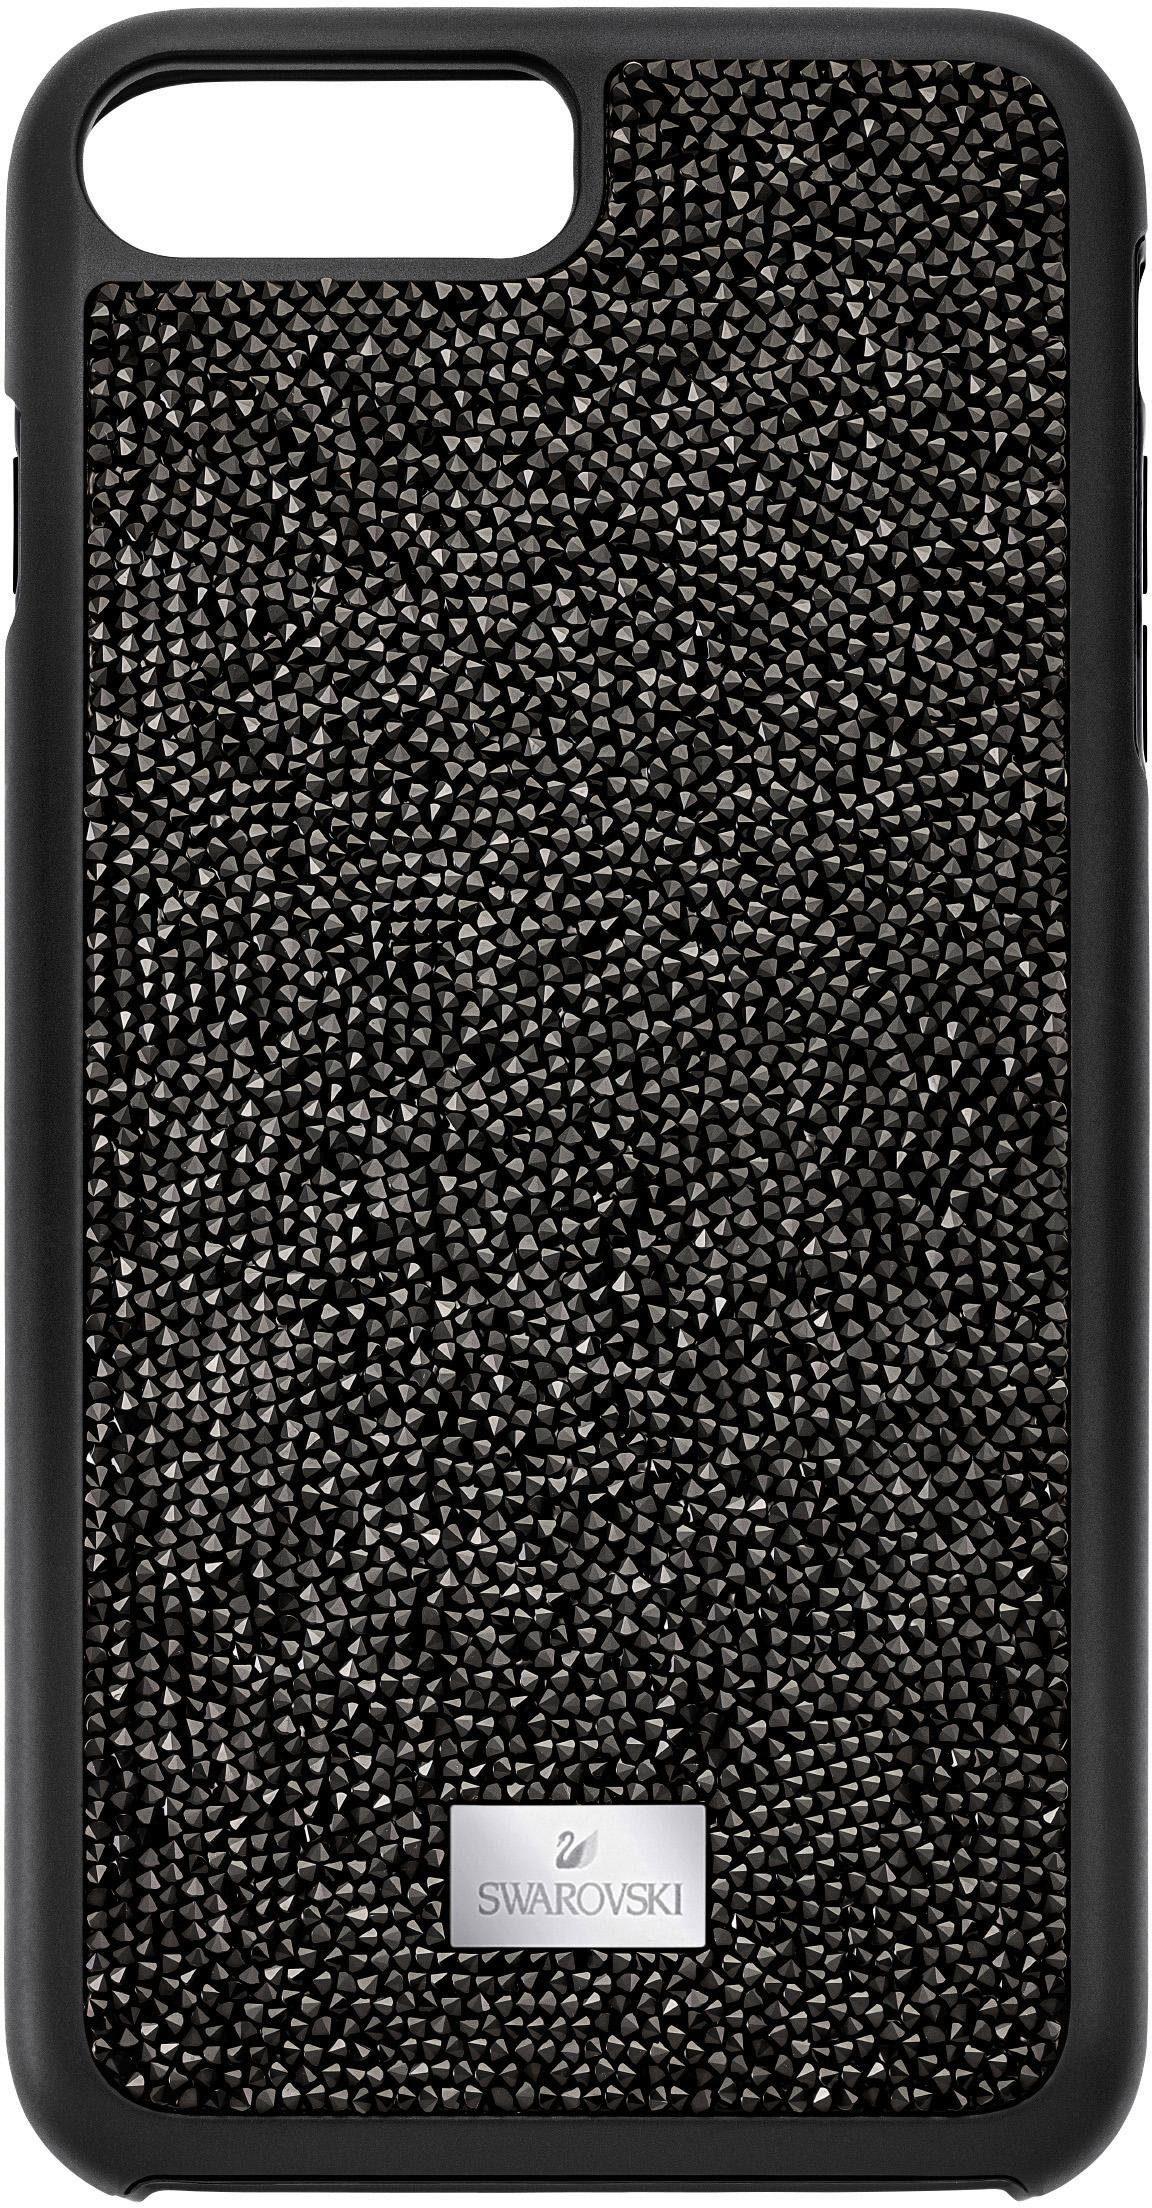 Swarovski »Glam Rock Etui mit integriertem Bumper, iPhone® 8 Plus, 5300266« Smartphone-Hülle iPhone® 8 Plus